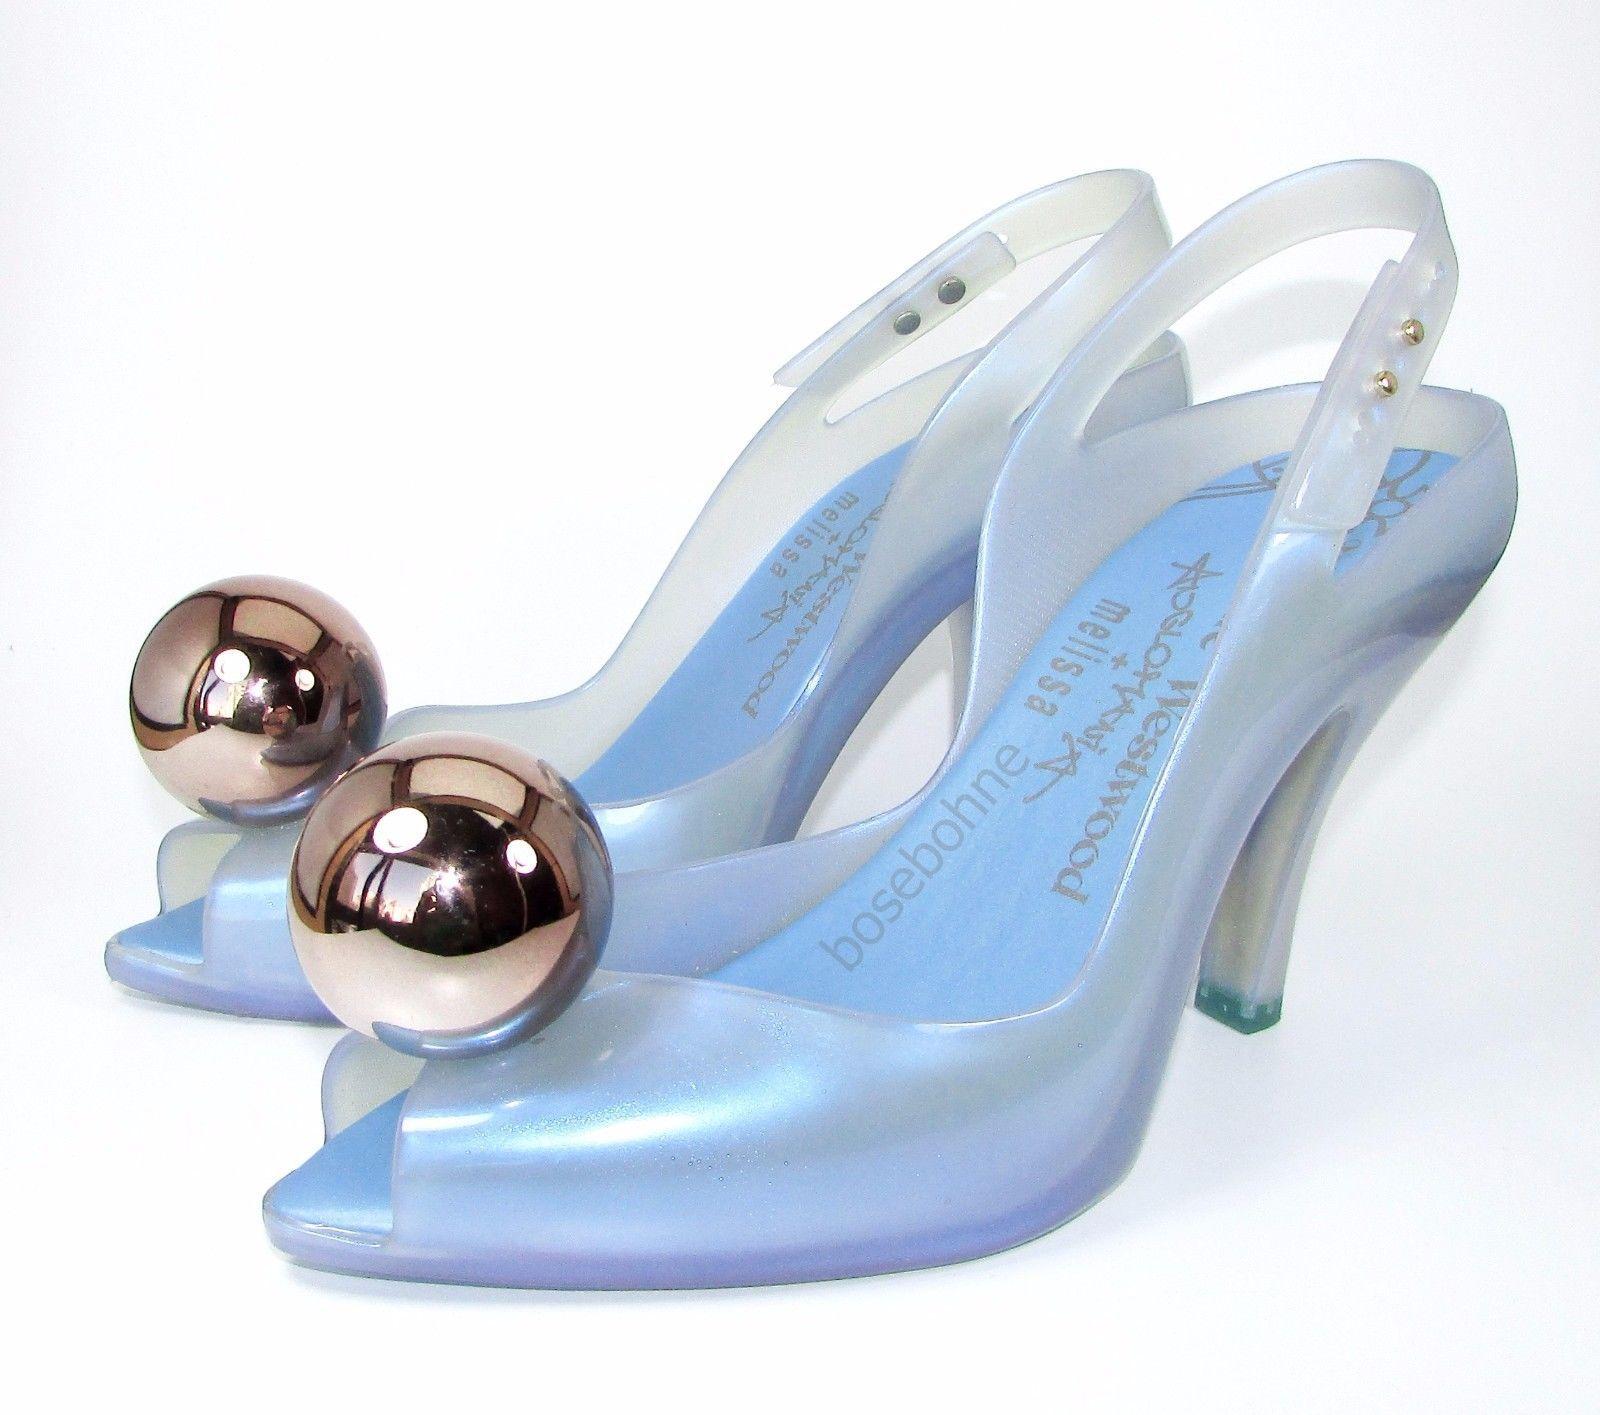 NIB Vivienne Westwood Anglomania + Melissa Lady Dragon Ball Globe US 7 EUR  38  4dc99215f8d0